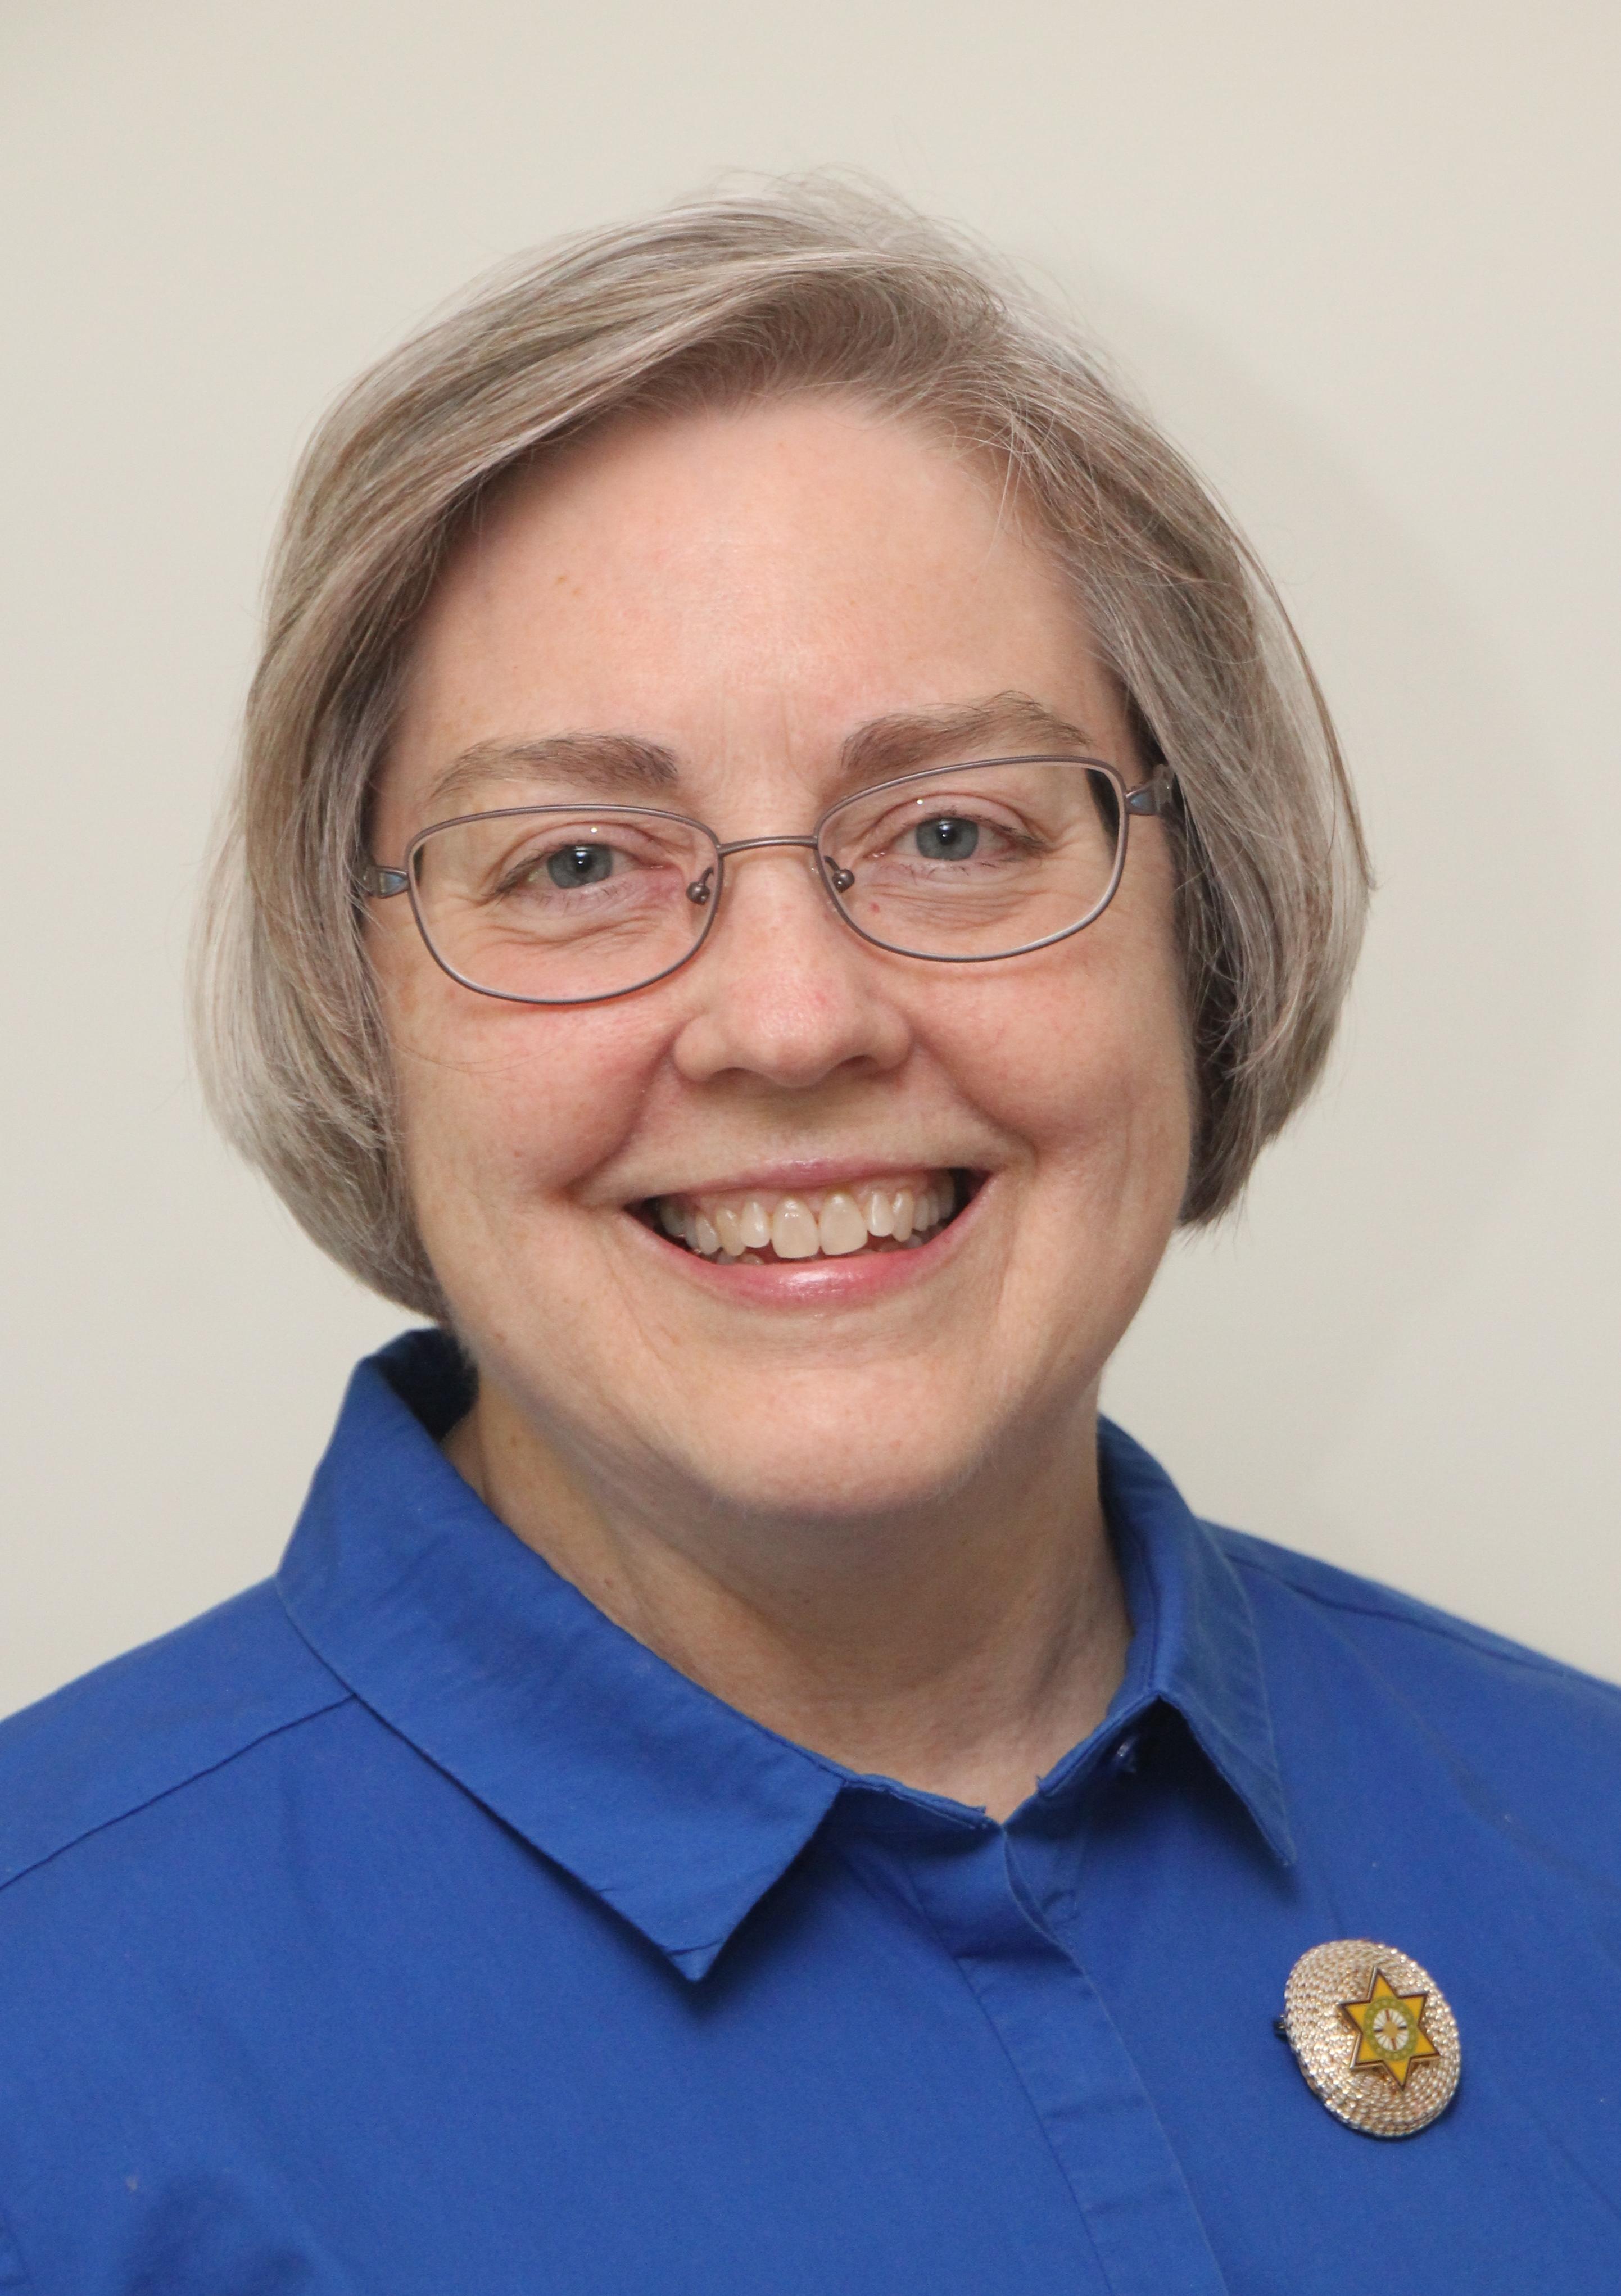 Dr. Sandra Amundsen